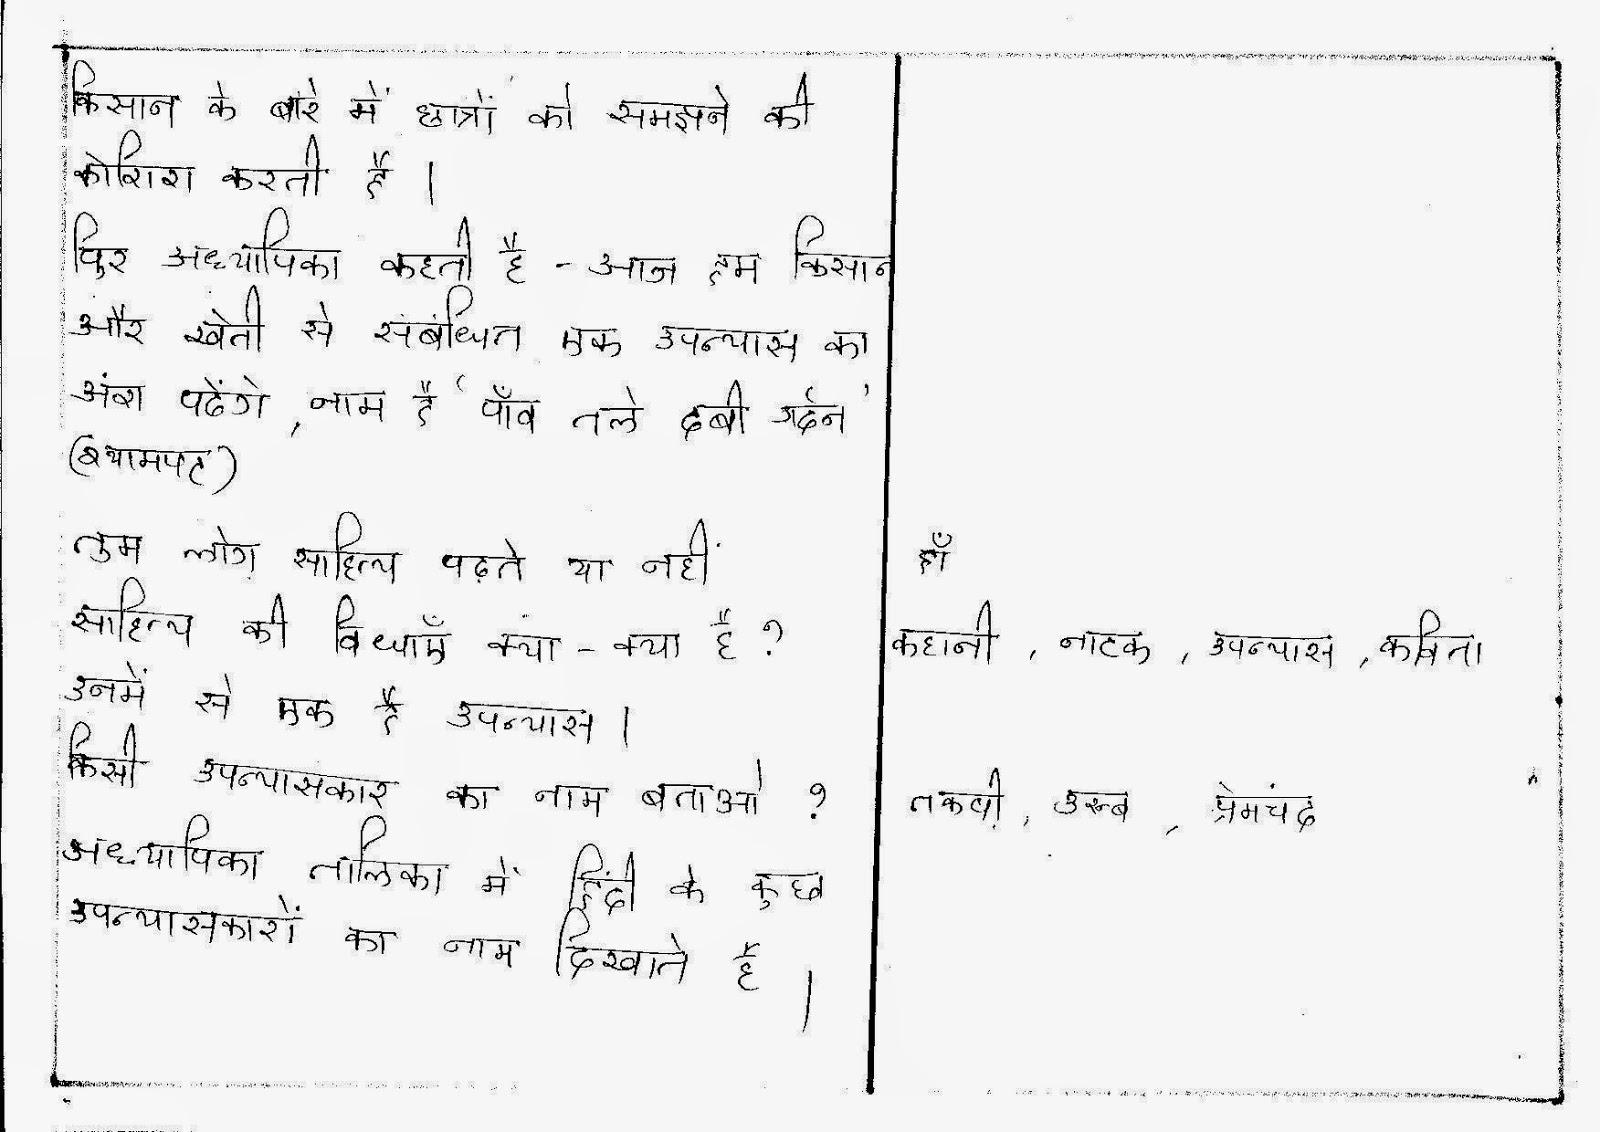 ranbir and katrina relationship poems